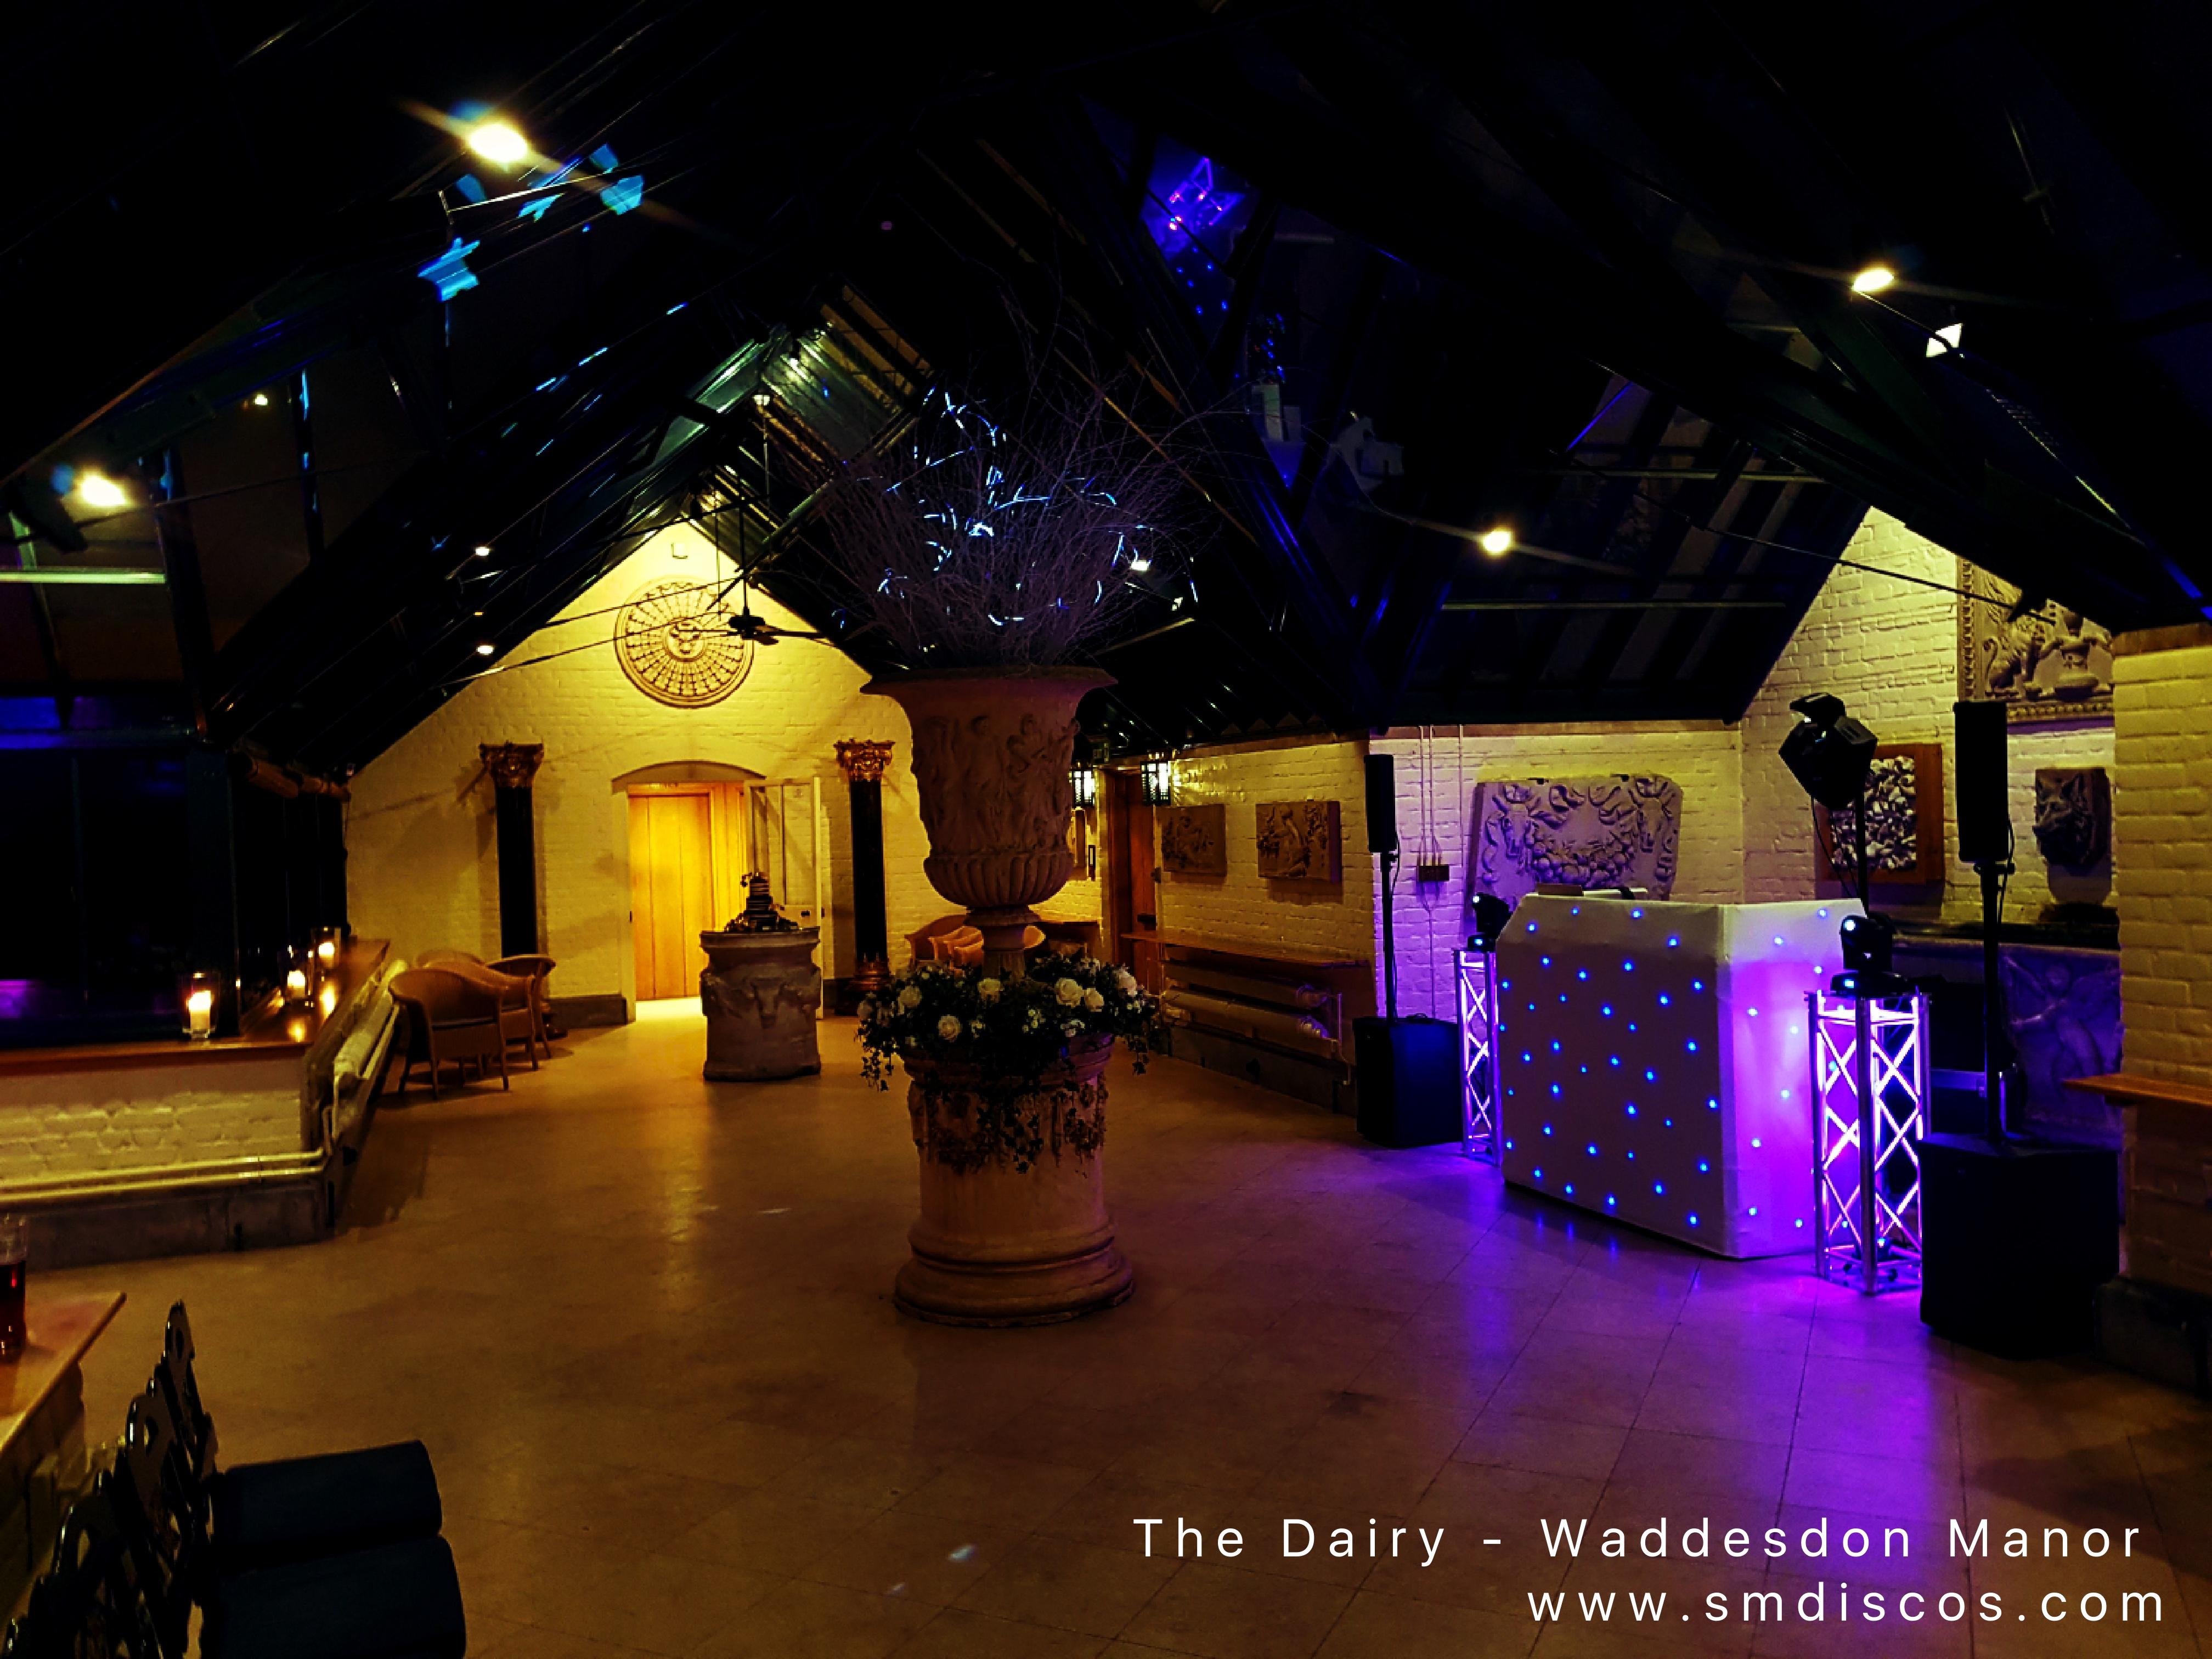 The Dairy at Waddesdon Manor DJ hire